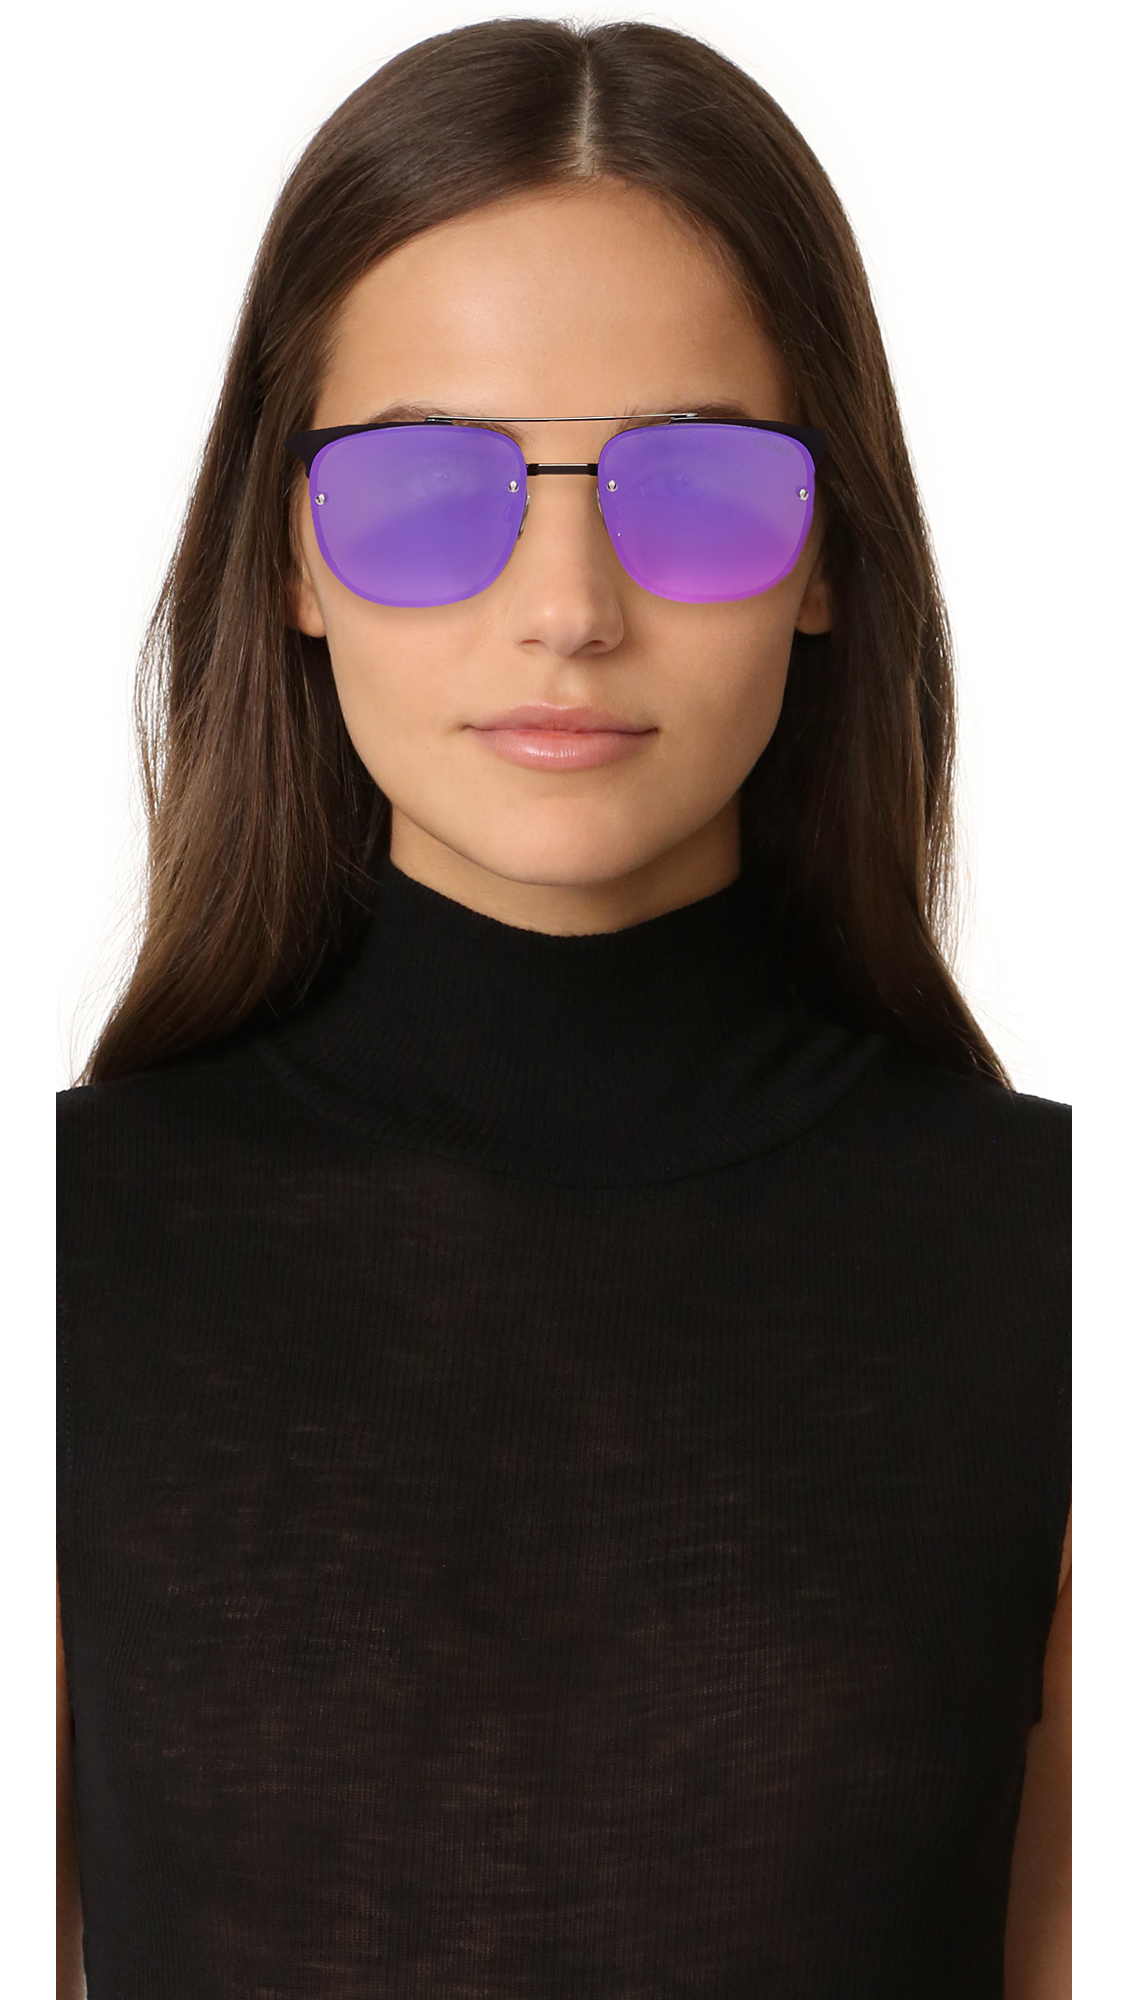 d47da887b4 Quay Private Eyes Sunglasses